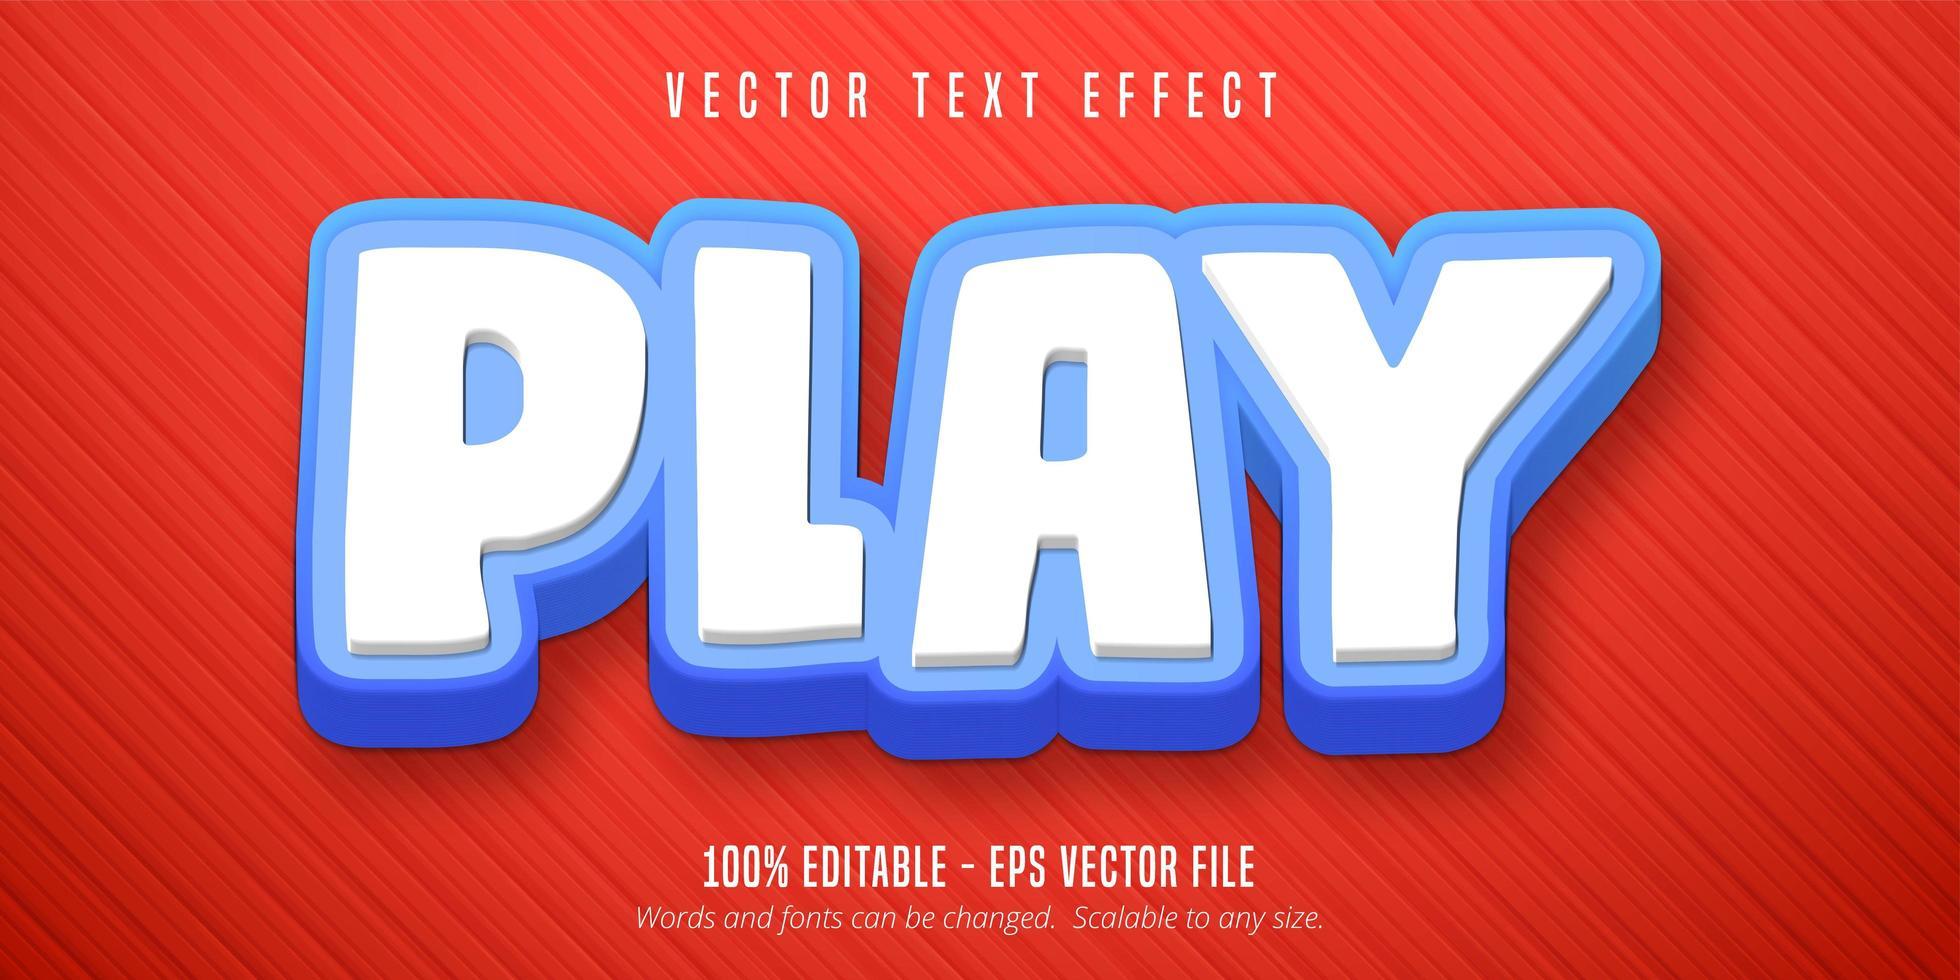 Bearbeiten Sie den bearbeitbaren Texteffekt im Cartoon-Stil vektor